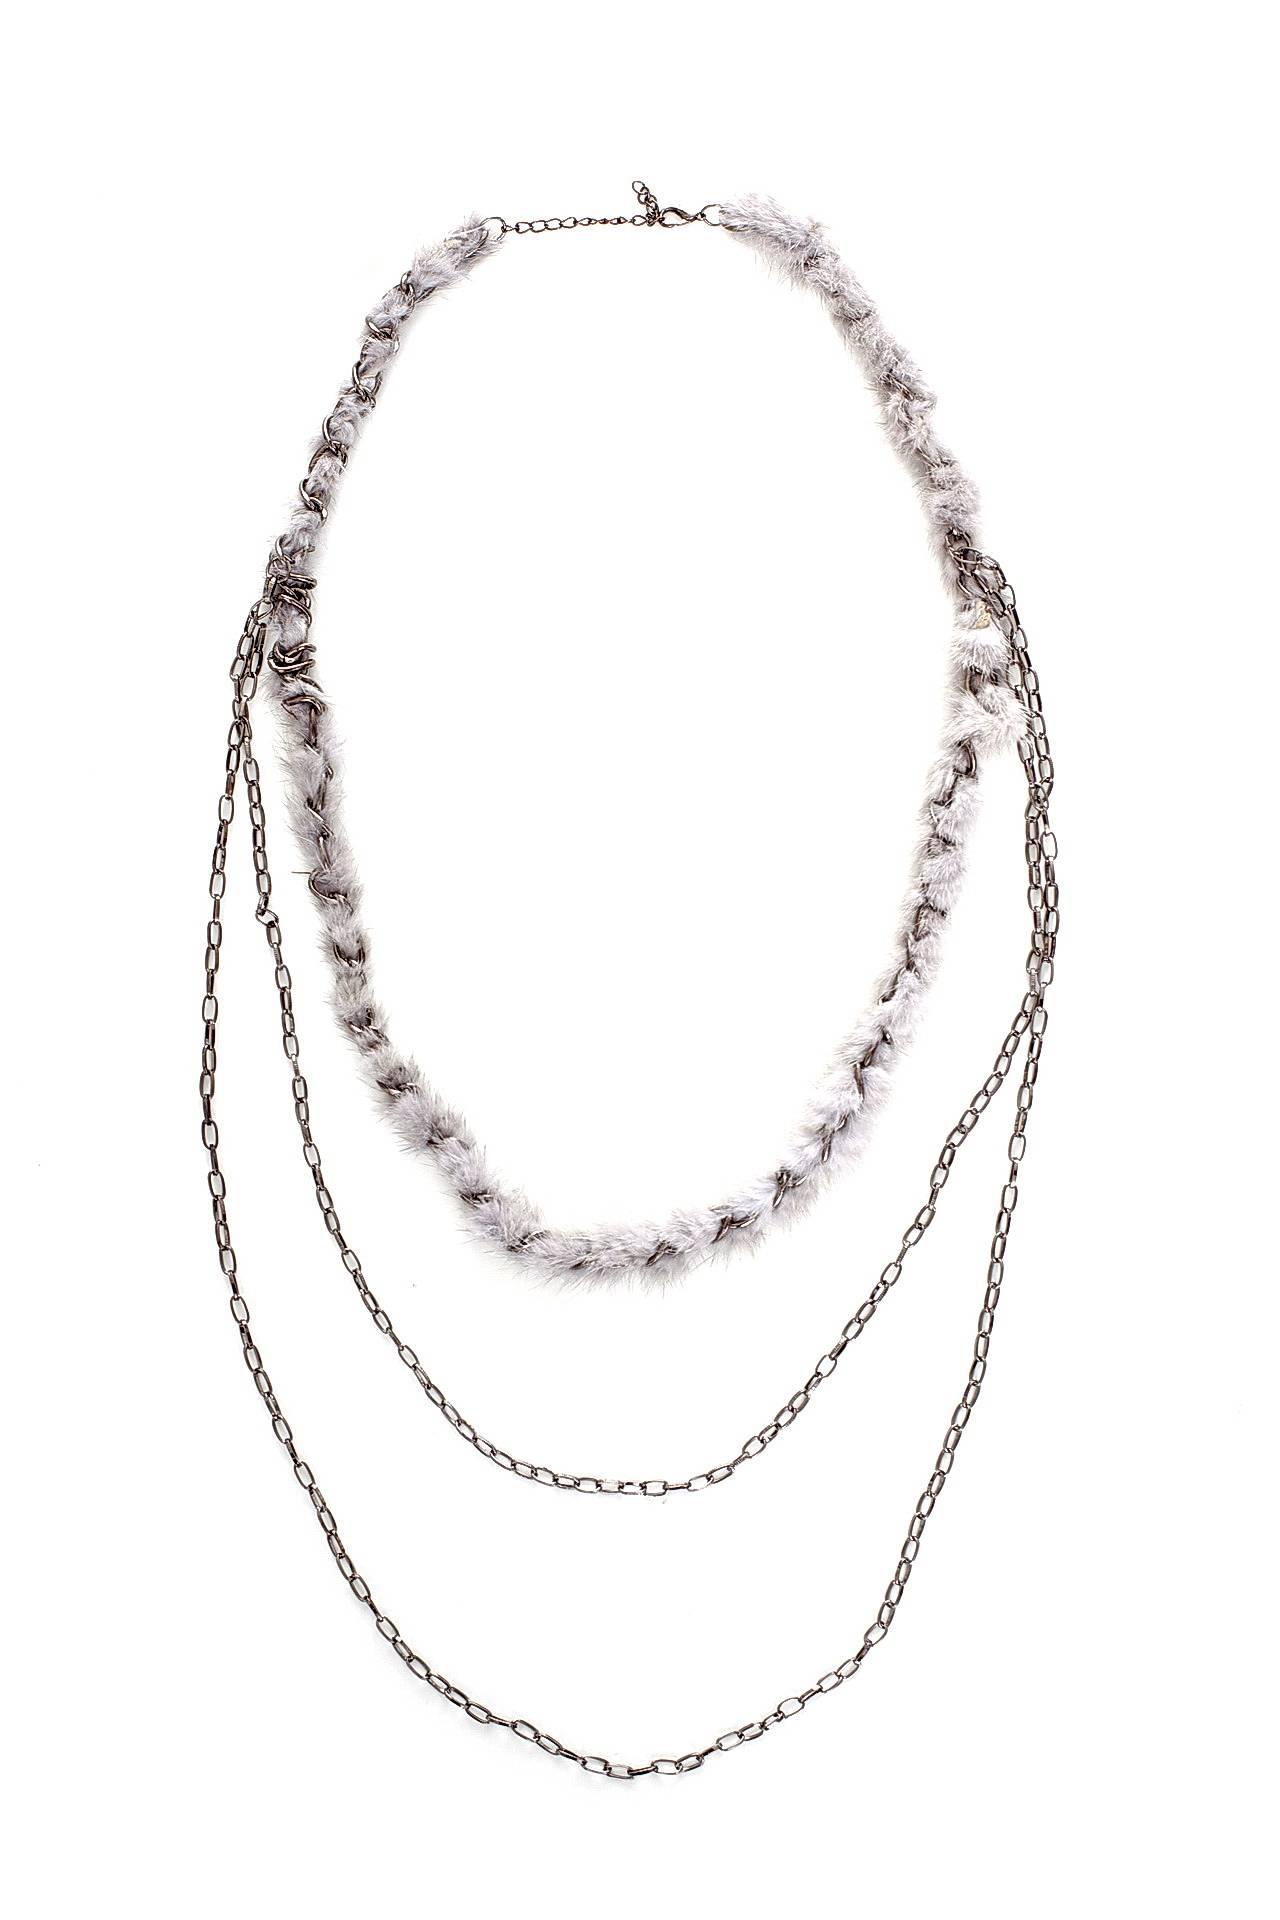 Цепь/цепочка бижутерная FASHION JEWERLY 34431-Б/р34431-Б/рЦепочка серебристая, якорного плетения, в три ряда, на одном - серый мех